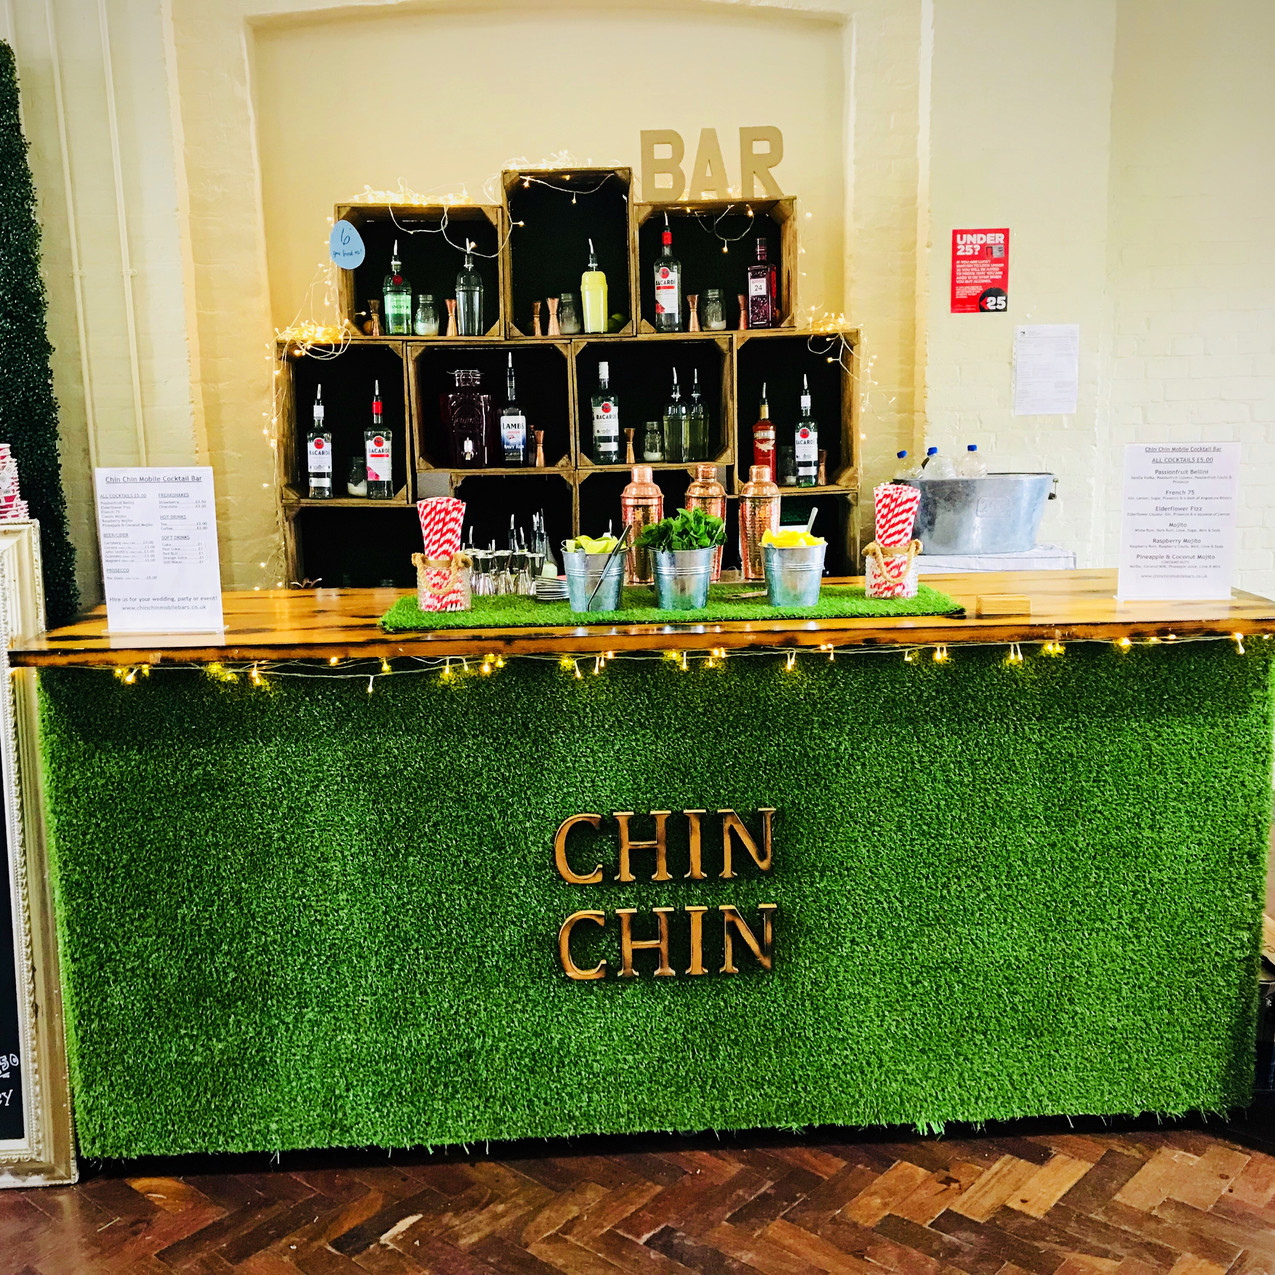 Chin Chin Lawn Bar at Etsy Made Local Event